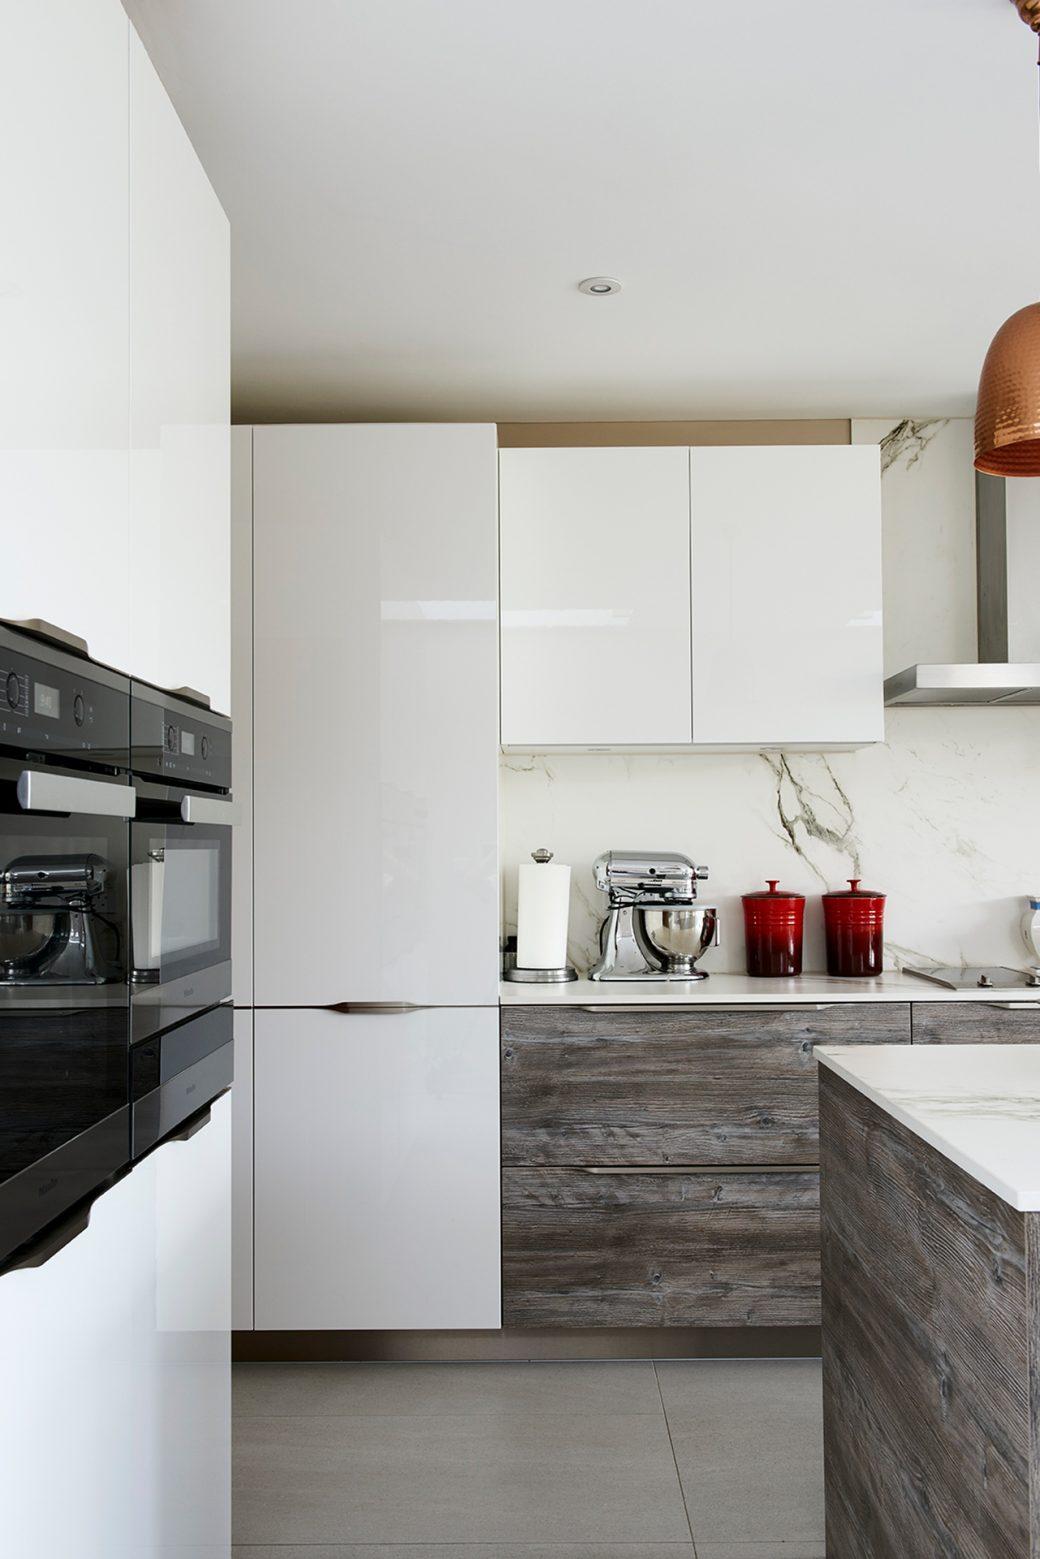 Wood effect & white gloss laminate kitchen cabinet doors